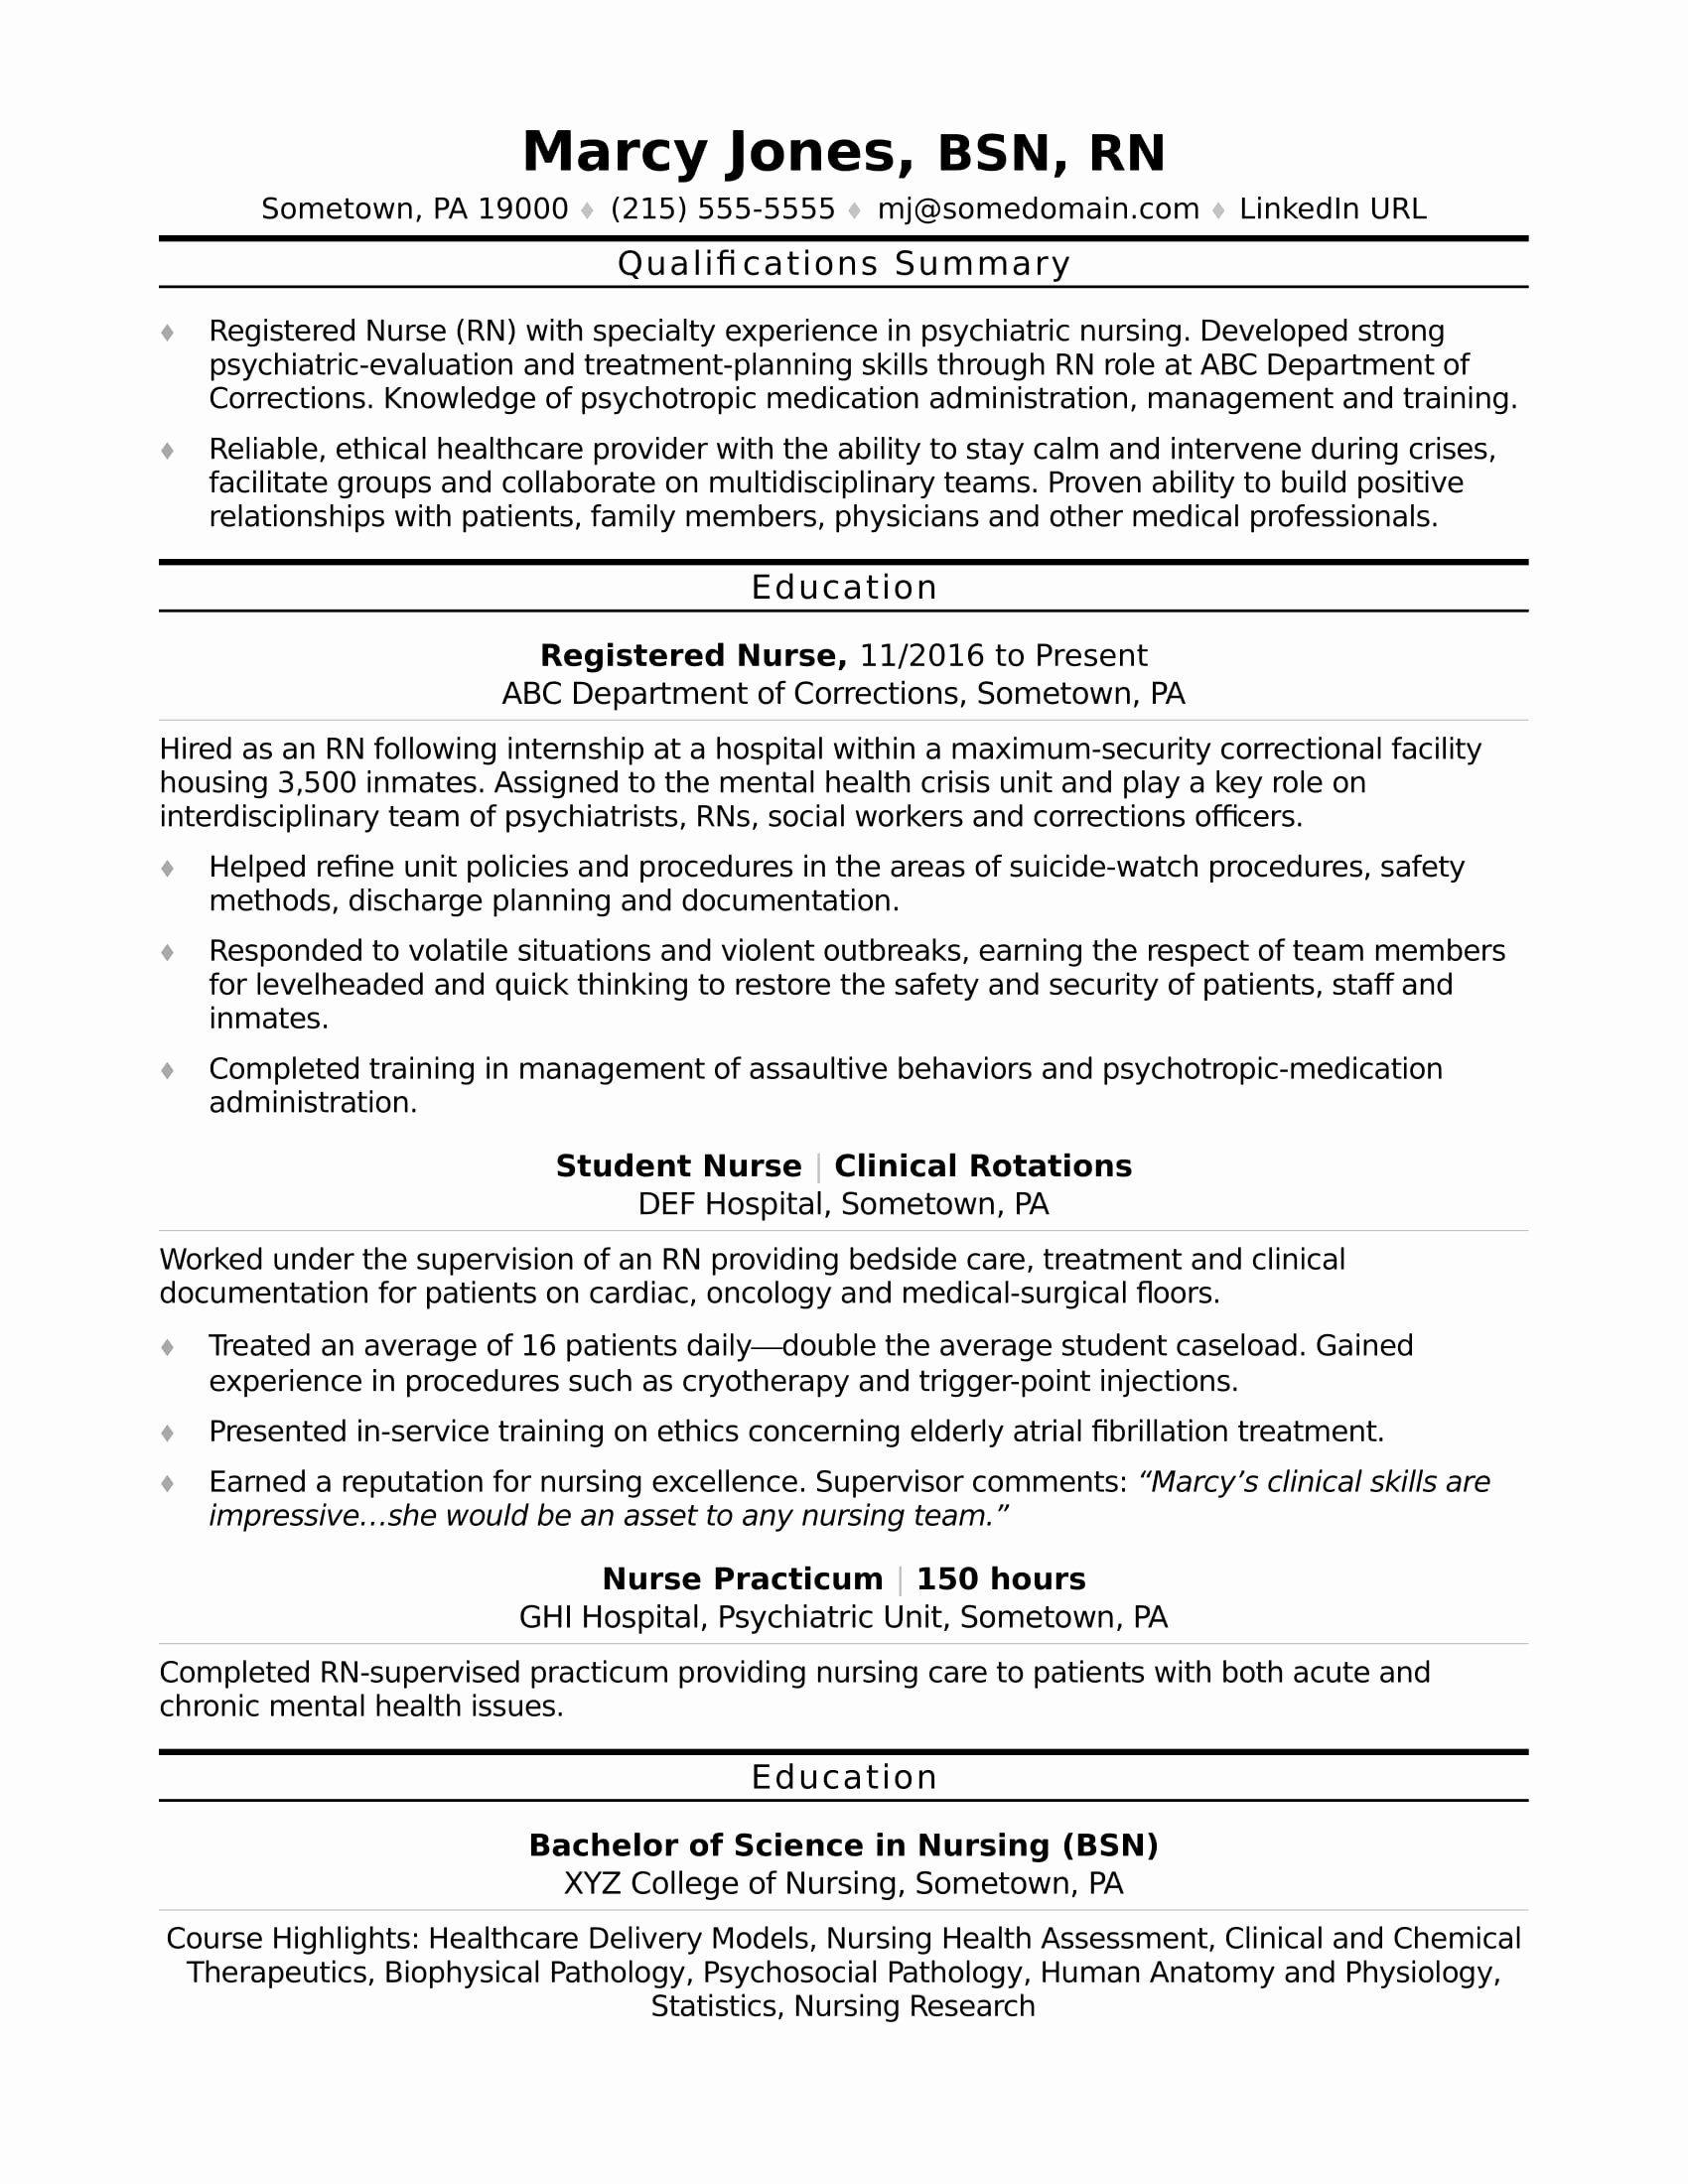 Nurse Skills For Resume Fresh Registered Nurse Rn Resume Sample Nursing Resume Examples Nursing Resume Template Registered Nurse Resume